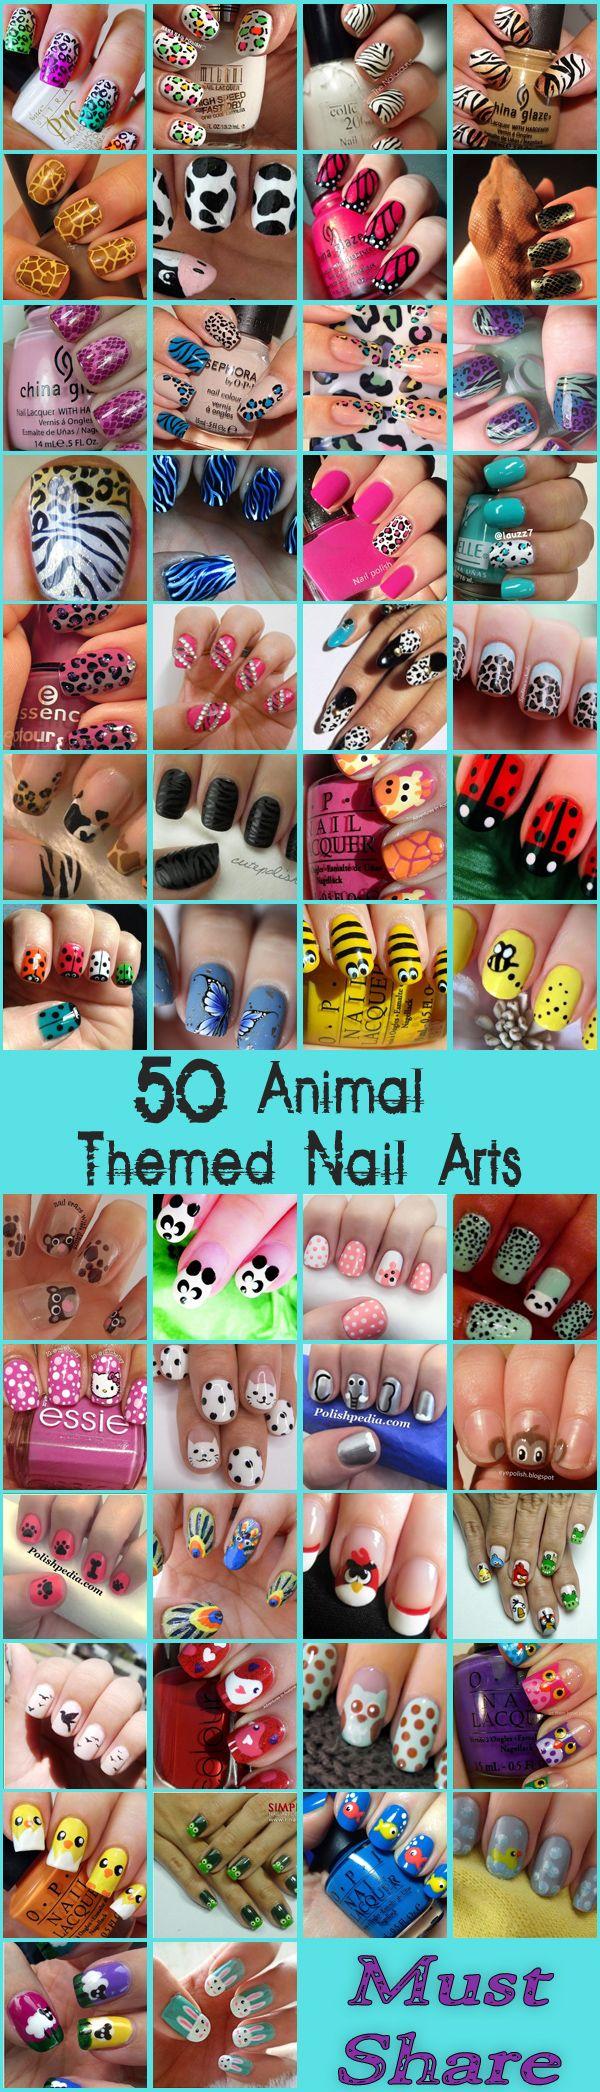 Nail Art Designs : Top 50 Animal Themed Nail Arts www.saturnostore.com